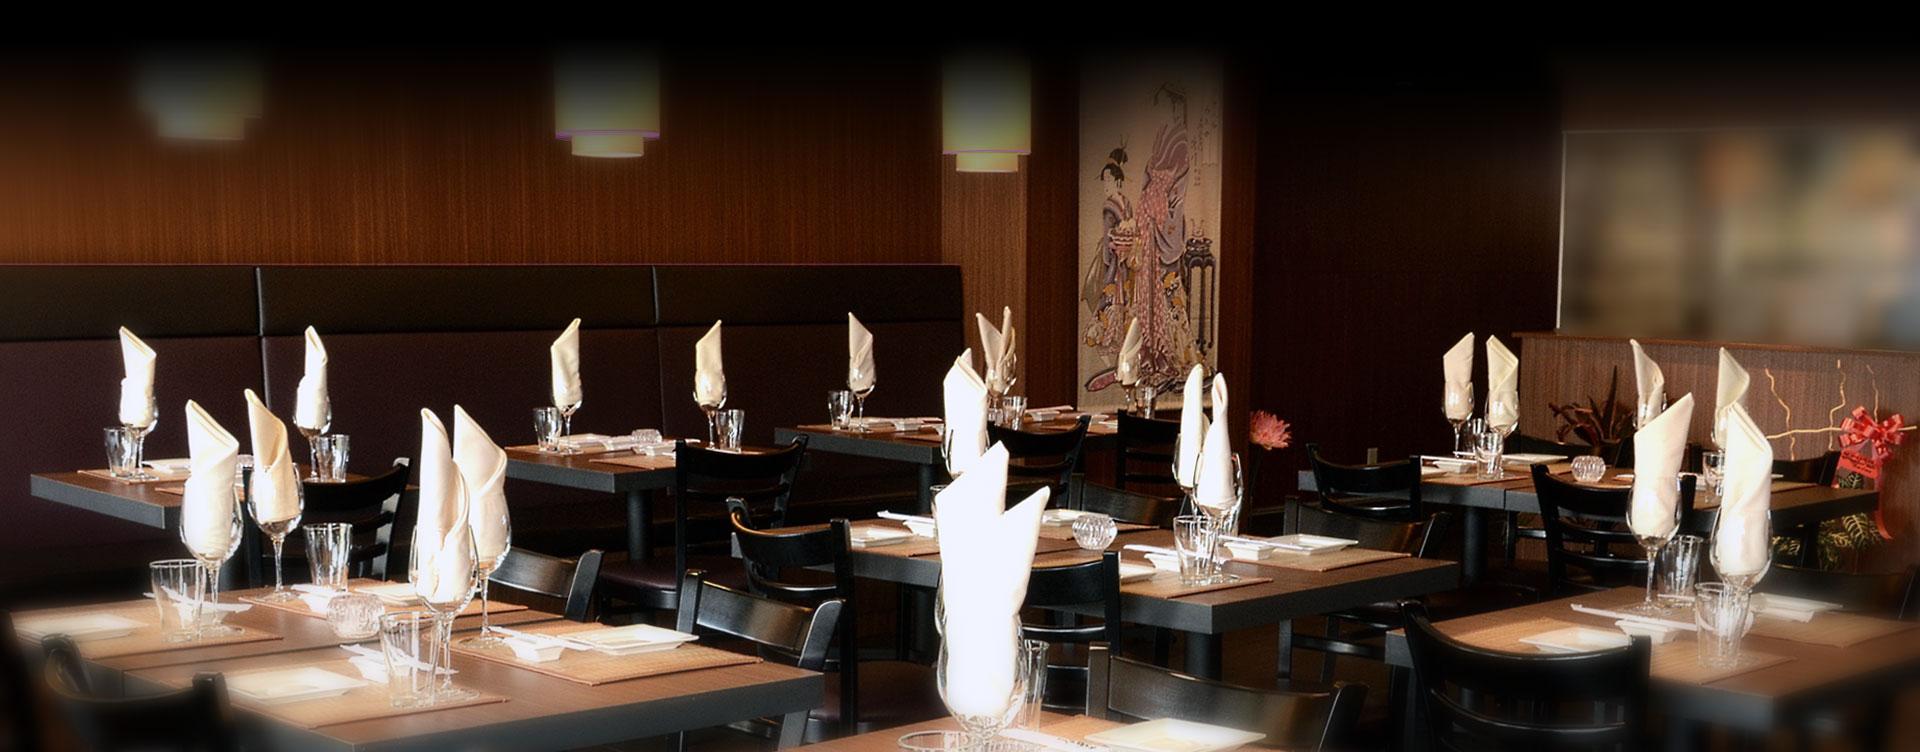 Takashi_Restaurant_Interieur07